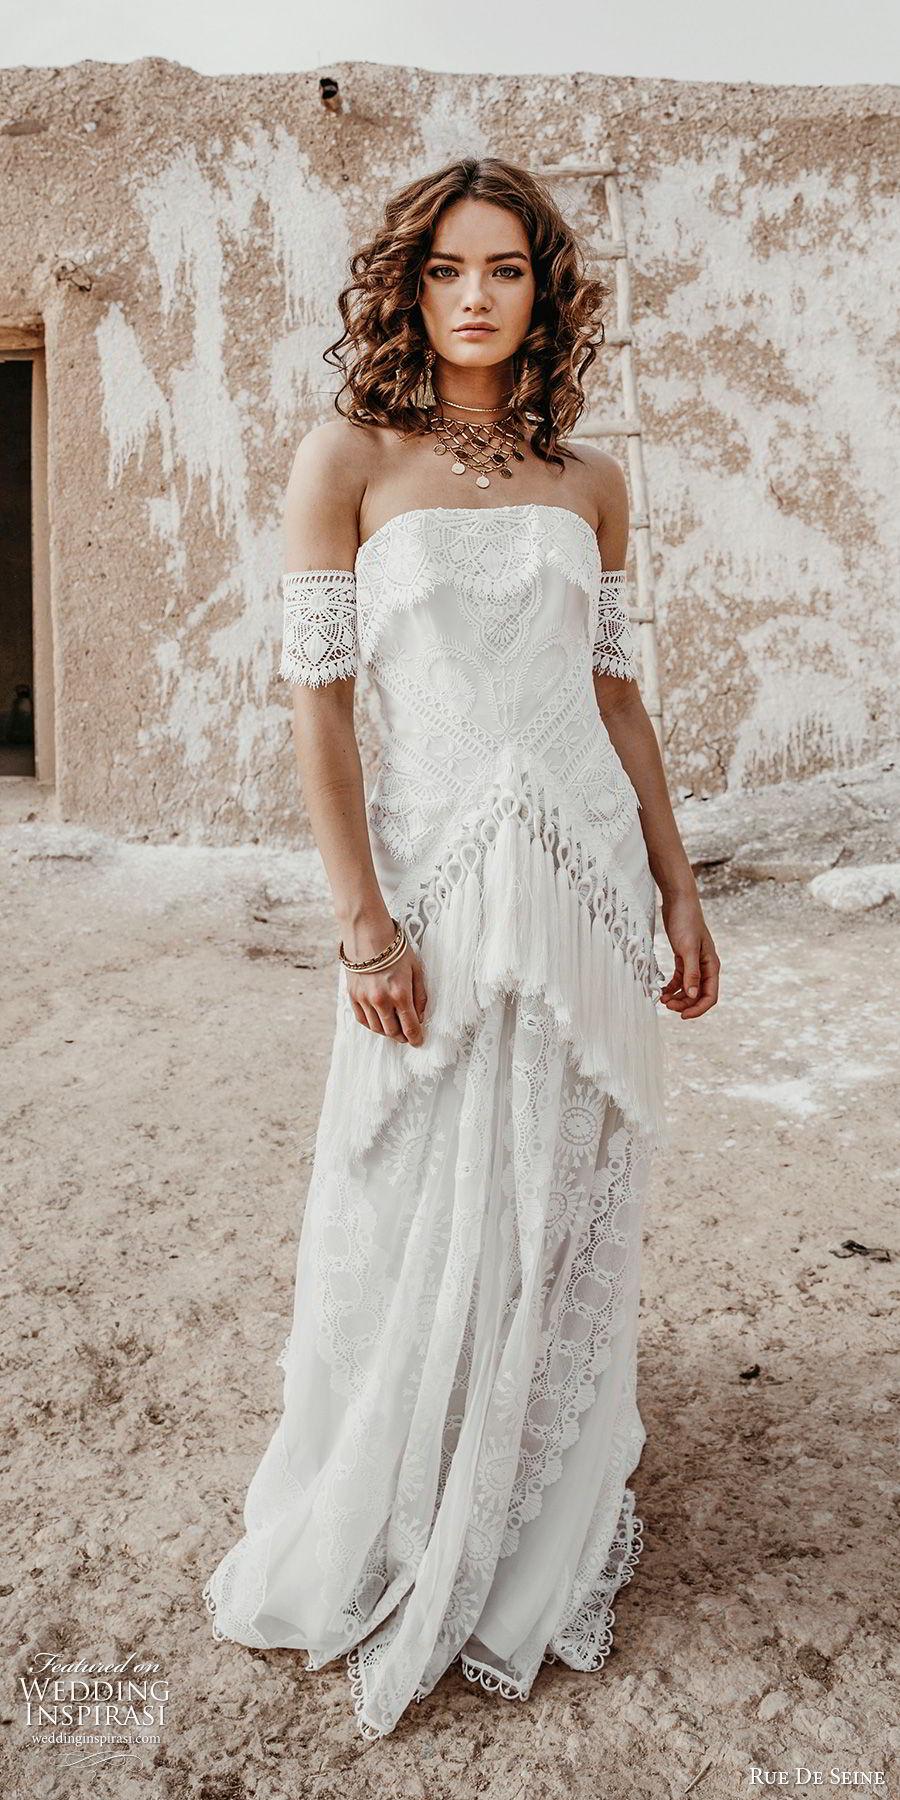 rue de seine 2019 bridal strapless straight across detached sleeves fully lace modified a line wedding dress (15) romantic boho chic chapel train mv